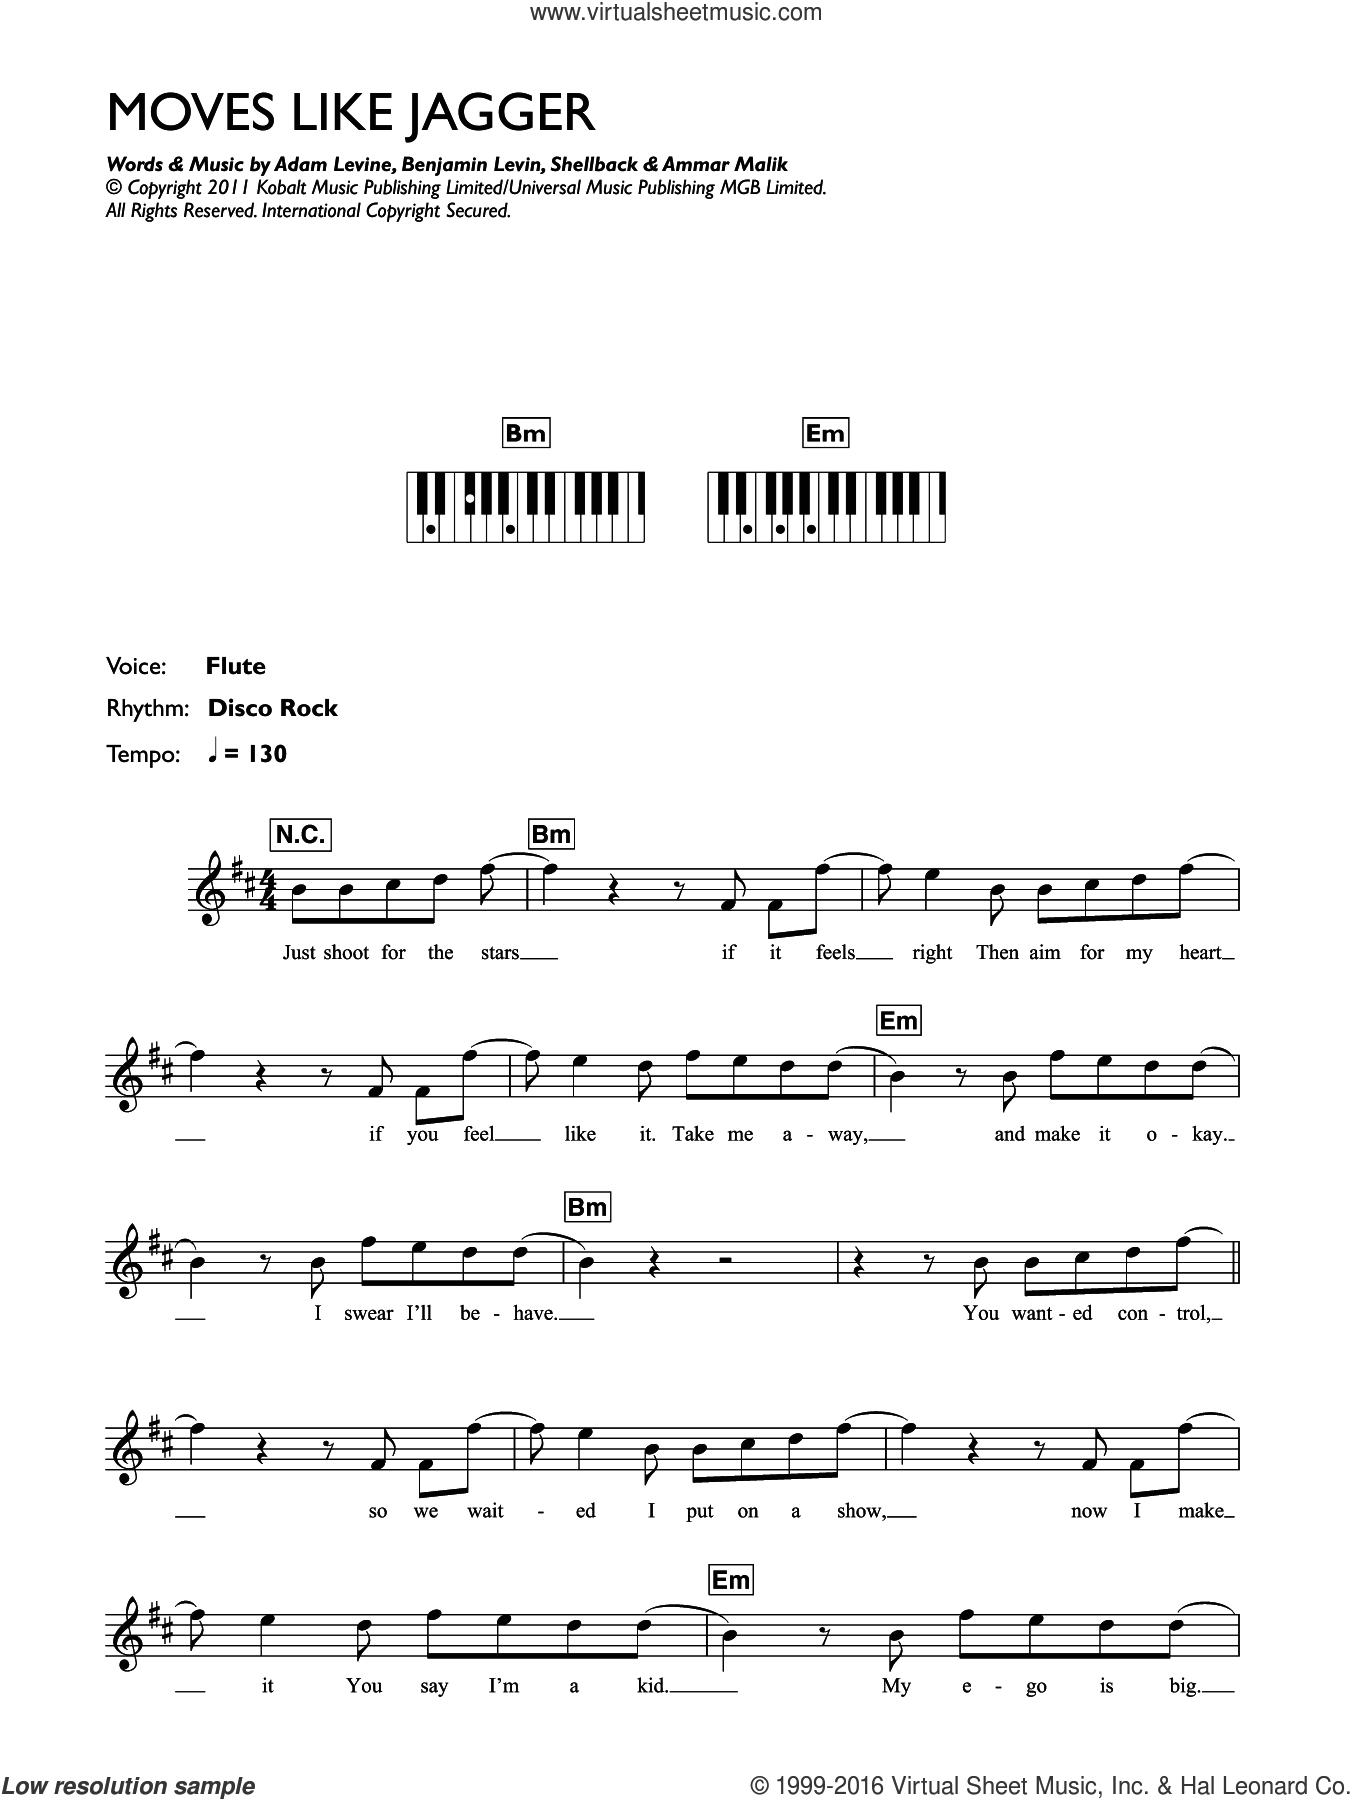 Moves Like Jagger (featuring Christina Aguilera) sheet music for piano solo (chords, lyrics, melody) by Maroon 5, Christina Aguilera, Adam Levine, Ammar Malik, Benjamin Levin and Shellback, intermediate piano (chords, lyrics, melody)